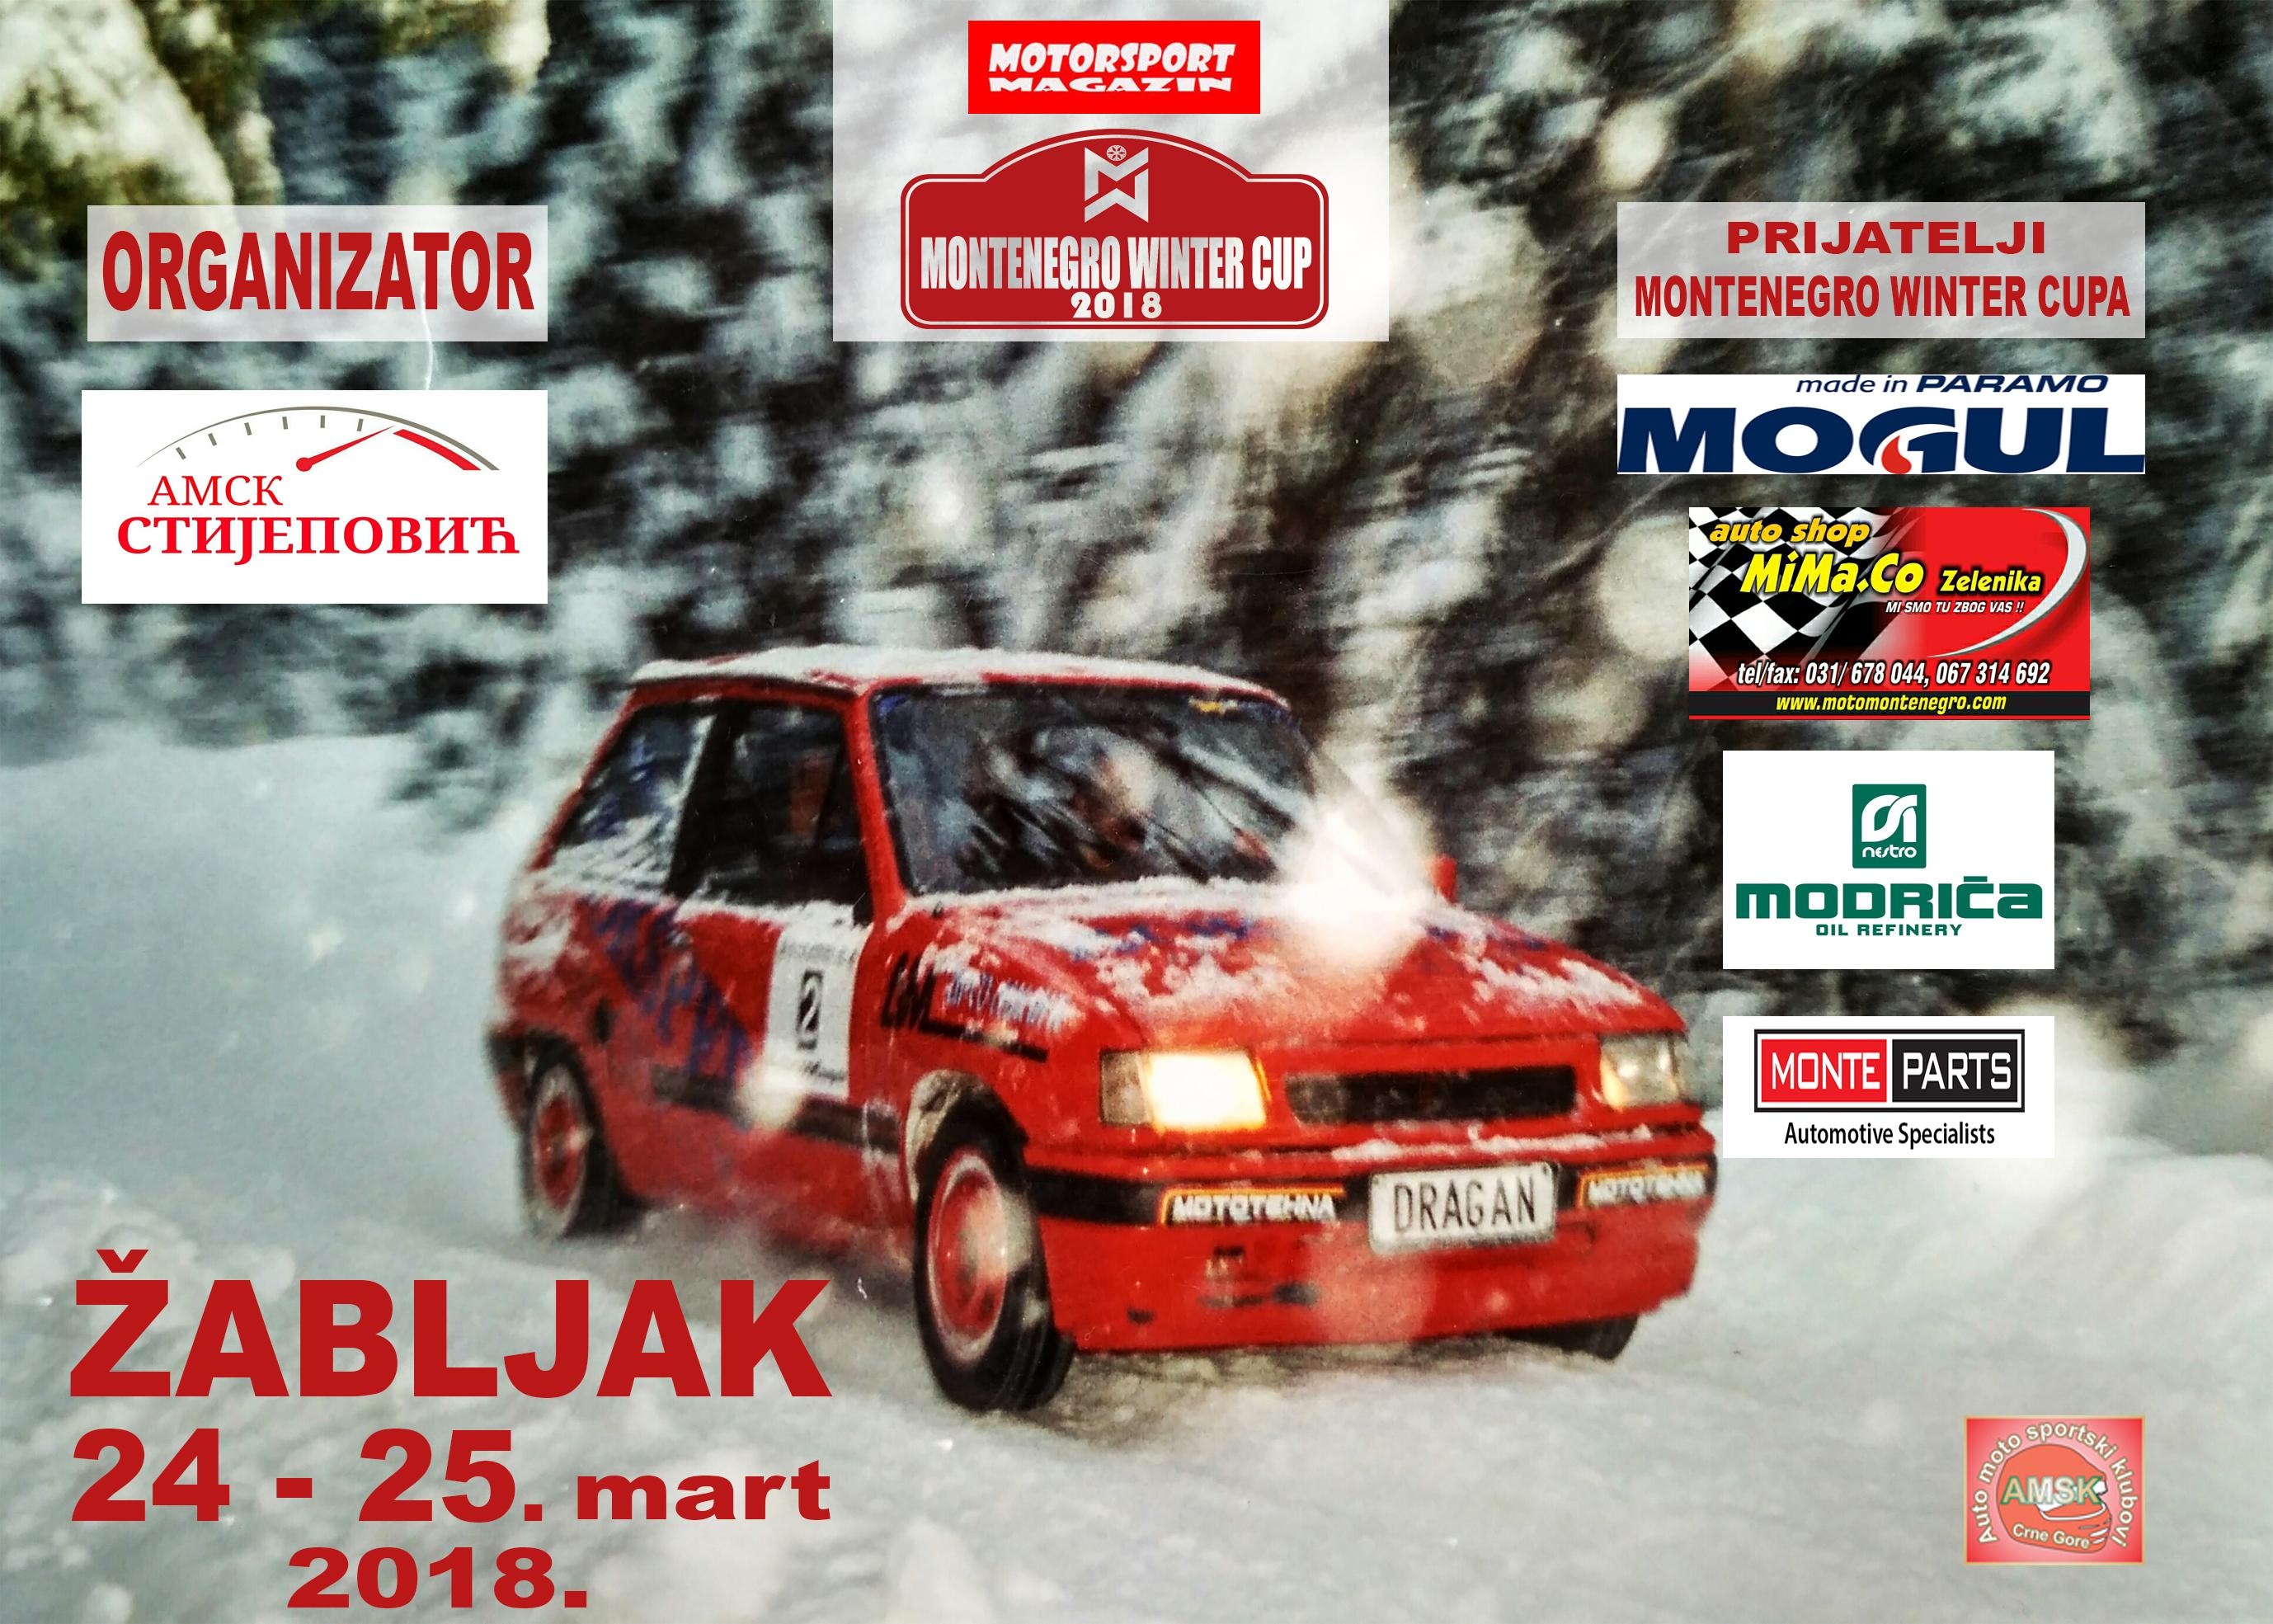 Druga trka Montenegro Winter Kupa ovog vikenda na Žabljaku